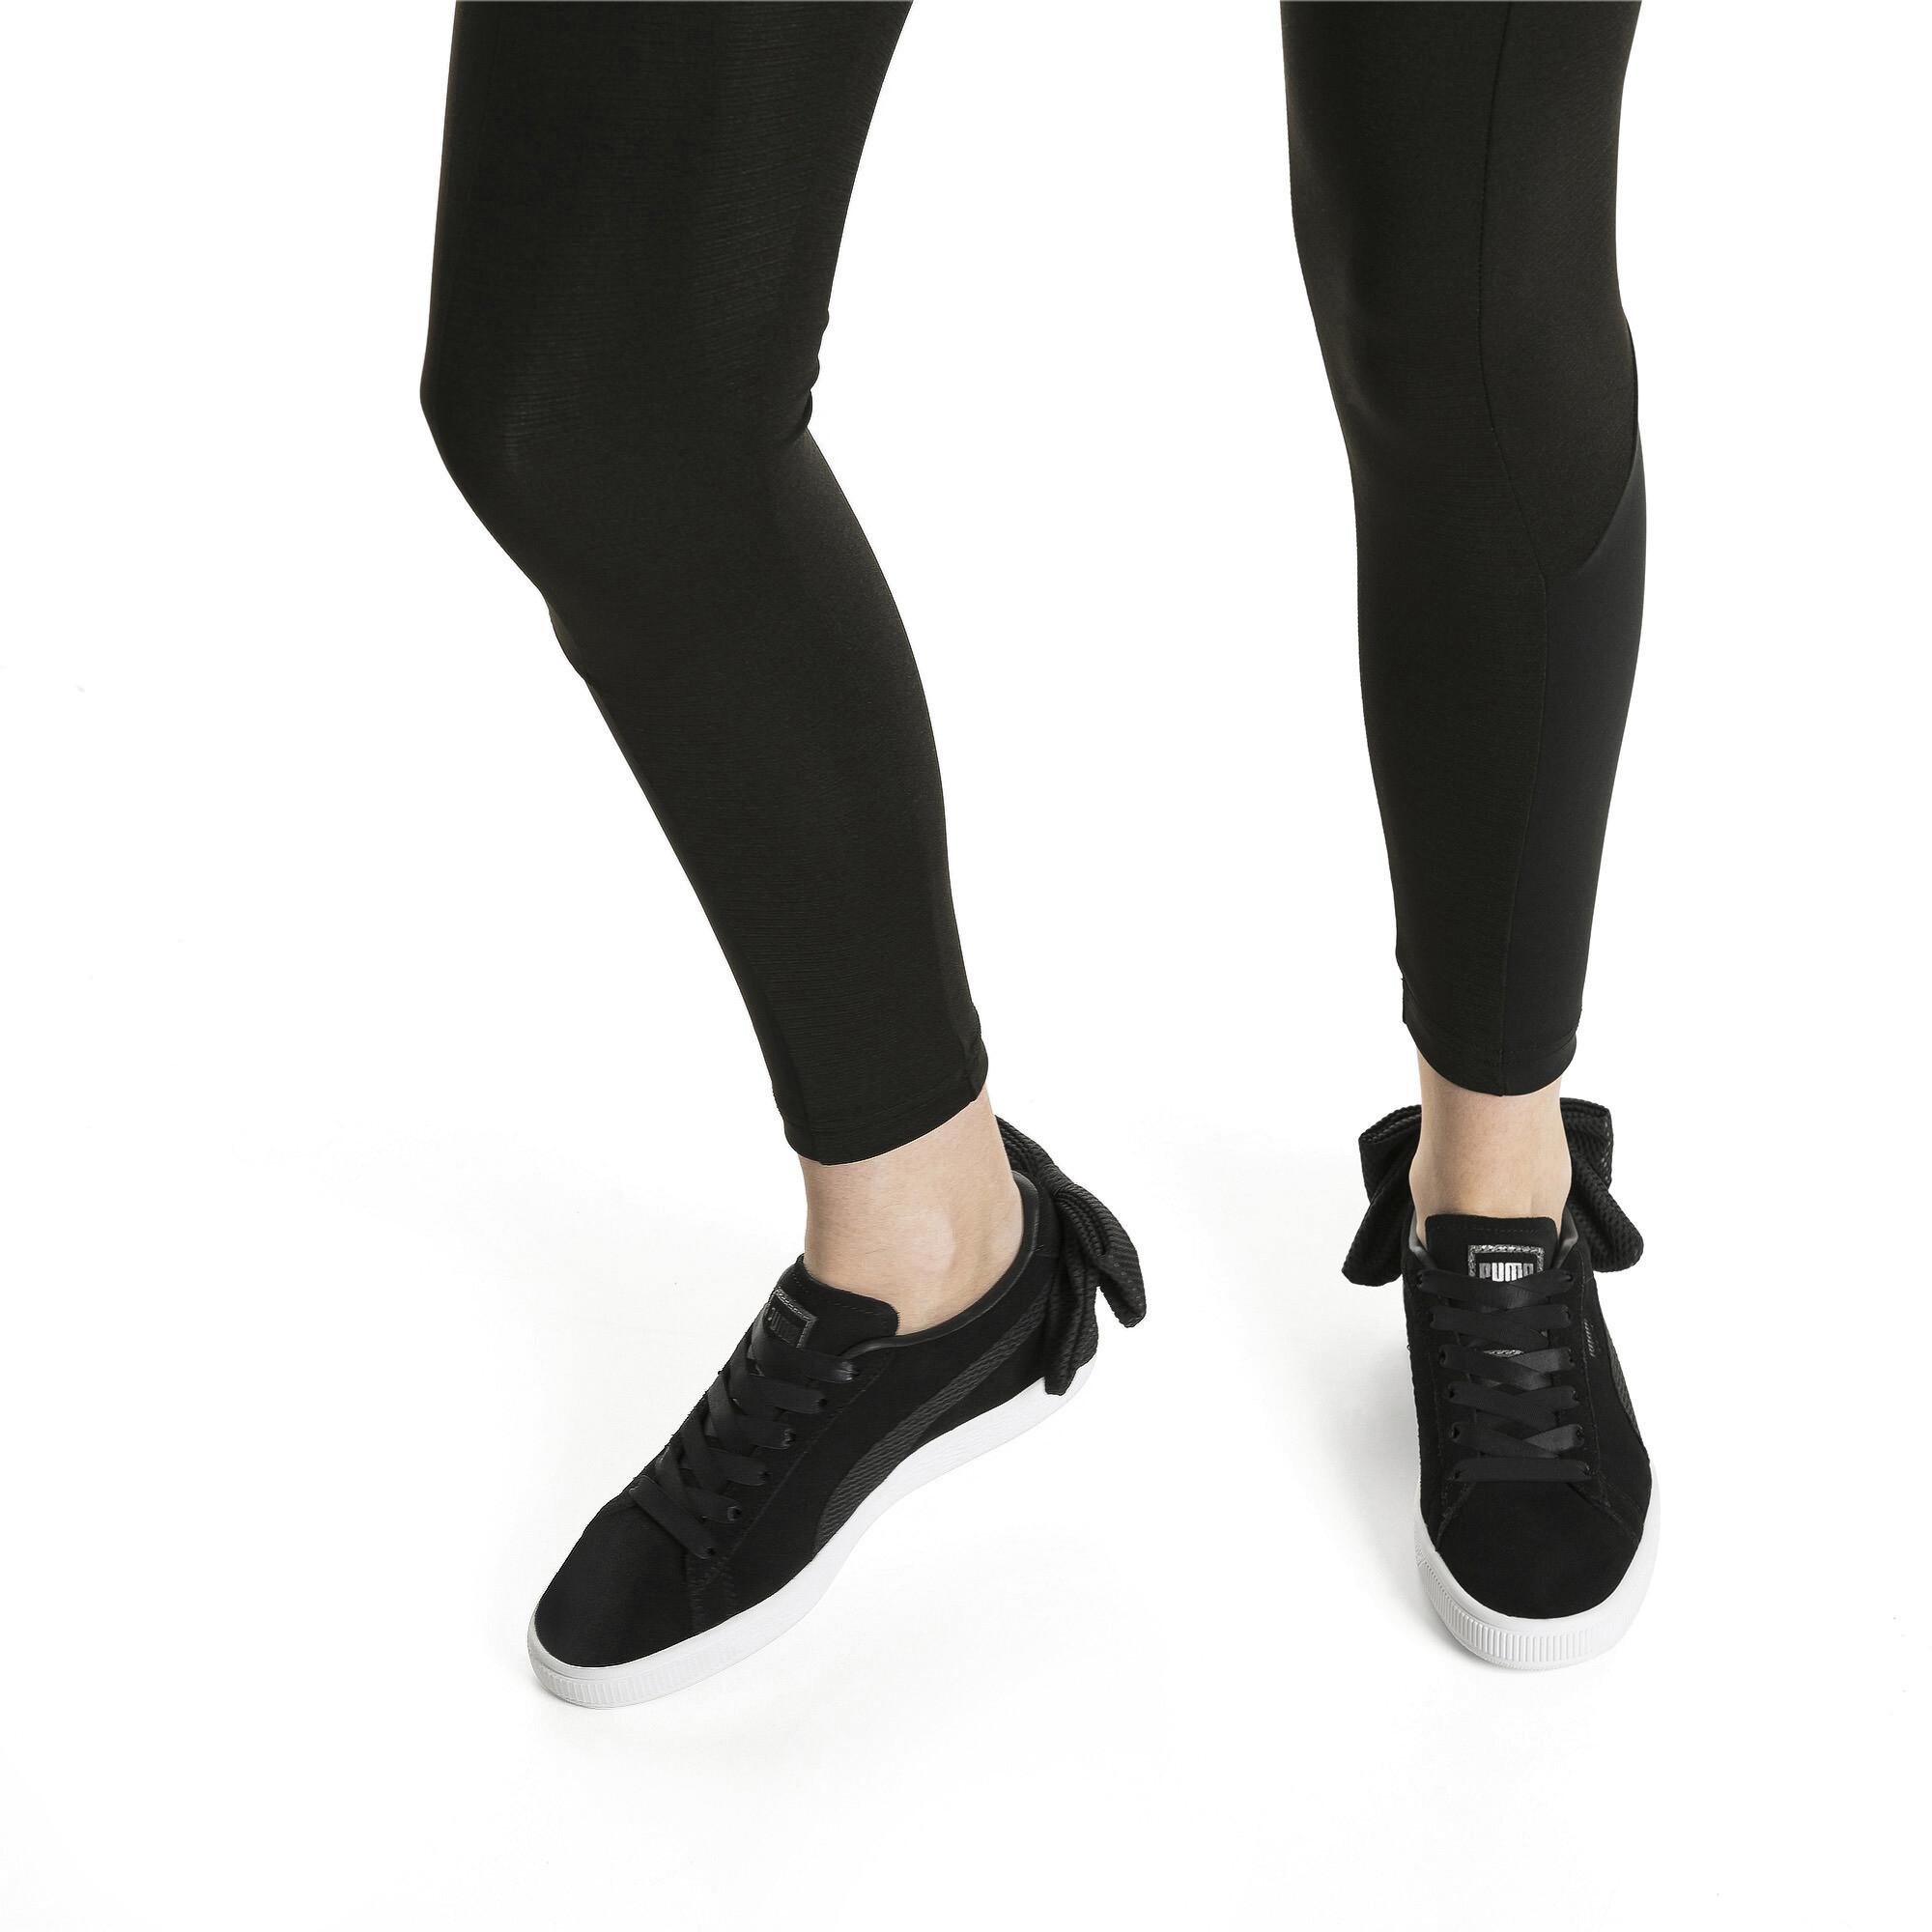 newest 48143 1c340 Details about PUMA Suede Bow Uprising Women's Sneakers Women Shoe Sport  Classics